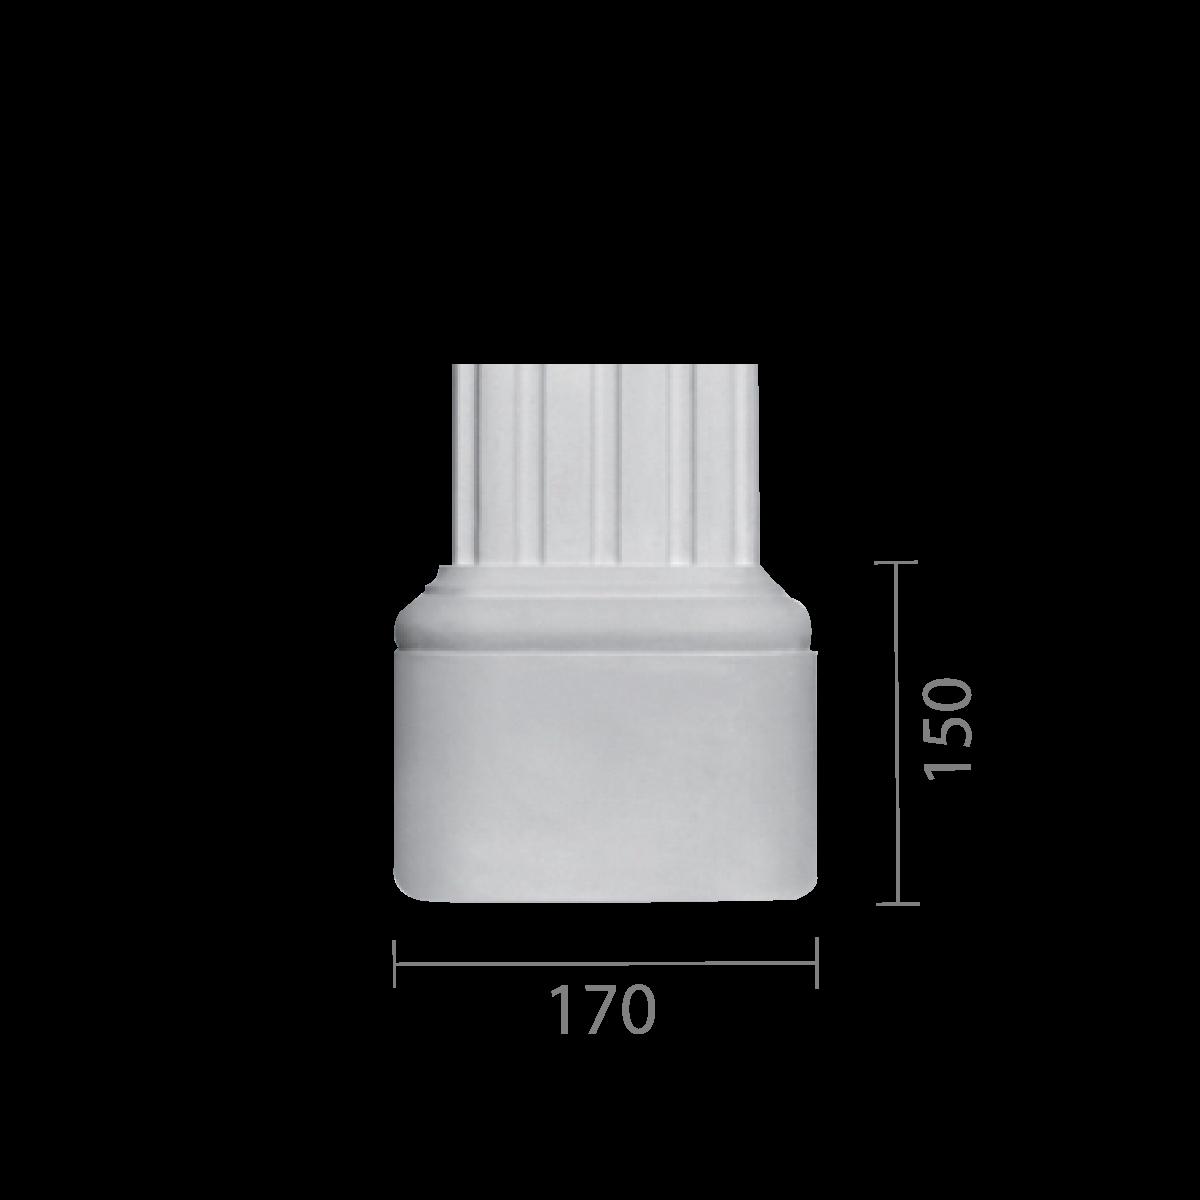 База колонны б-83 (пилястра)